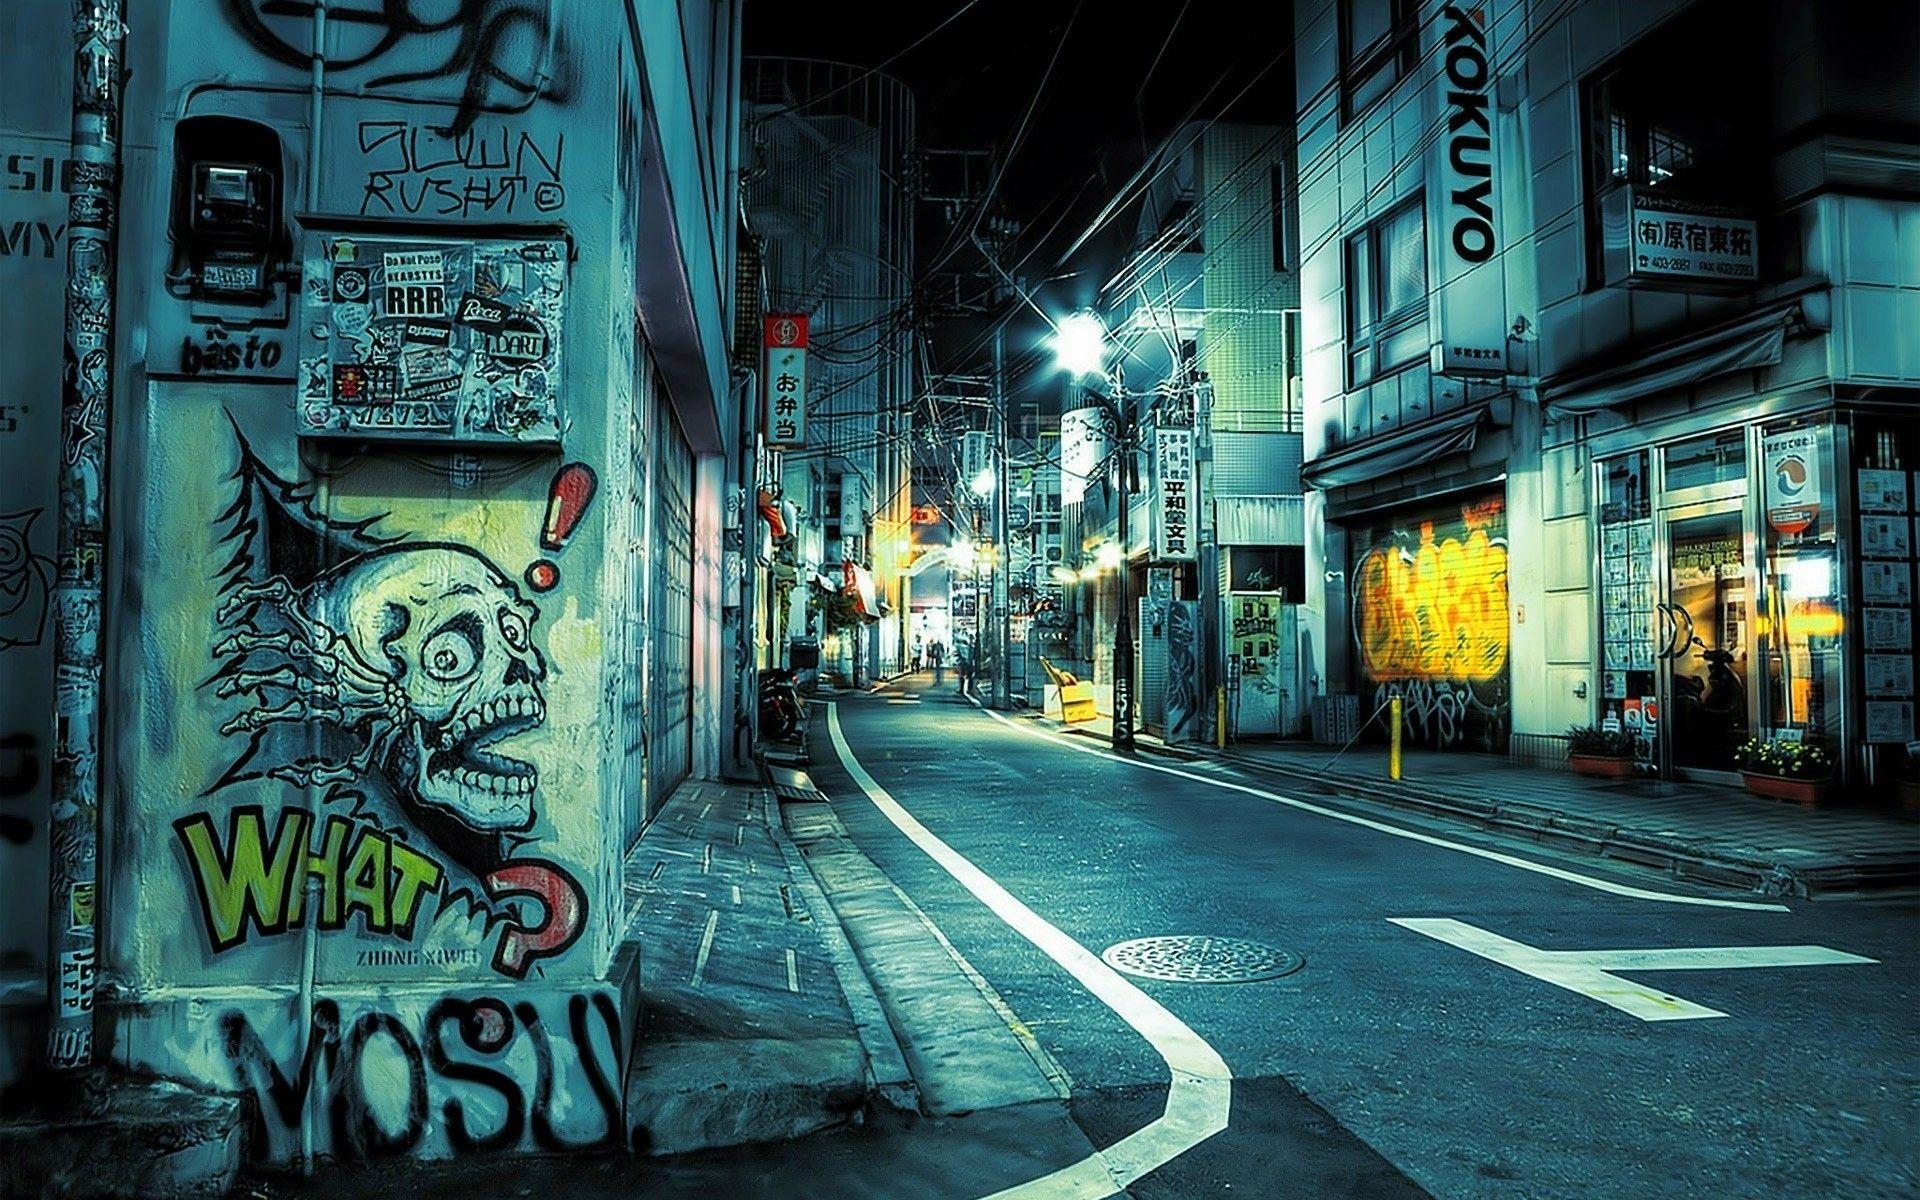 10 Latest Urban Street Backgrounds Hd Full Hd 1080p For Pc Background Street Graffiti Graffiti Wallpaper Street Art